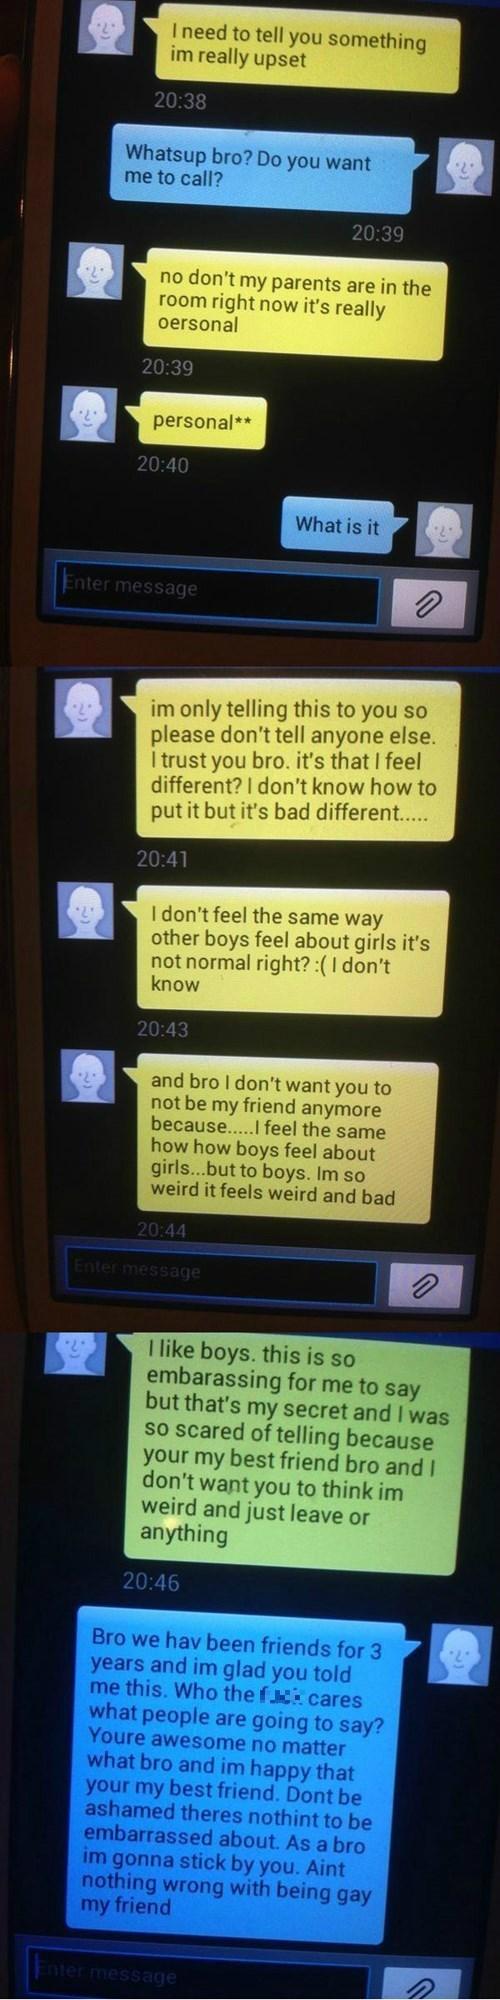 lgbtq random act of kindness texting dating - 8382570496